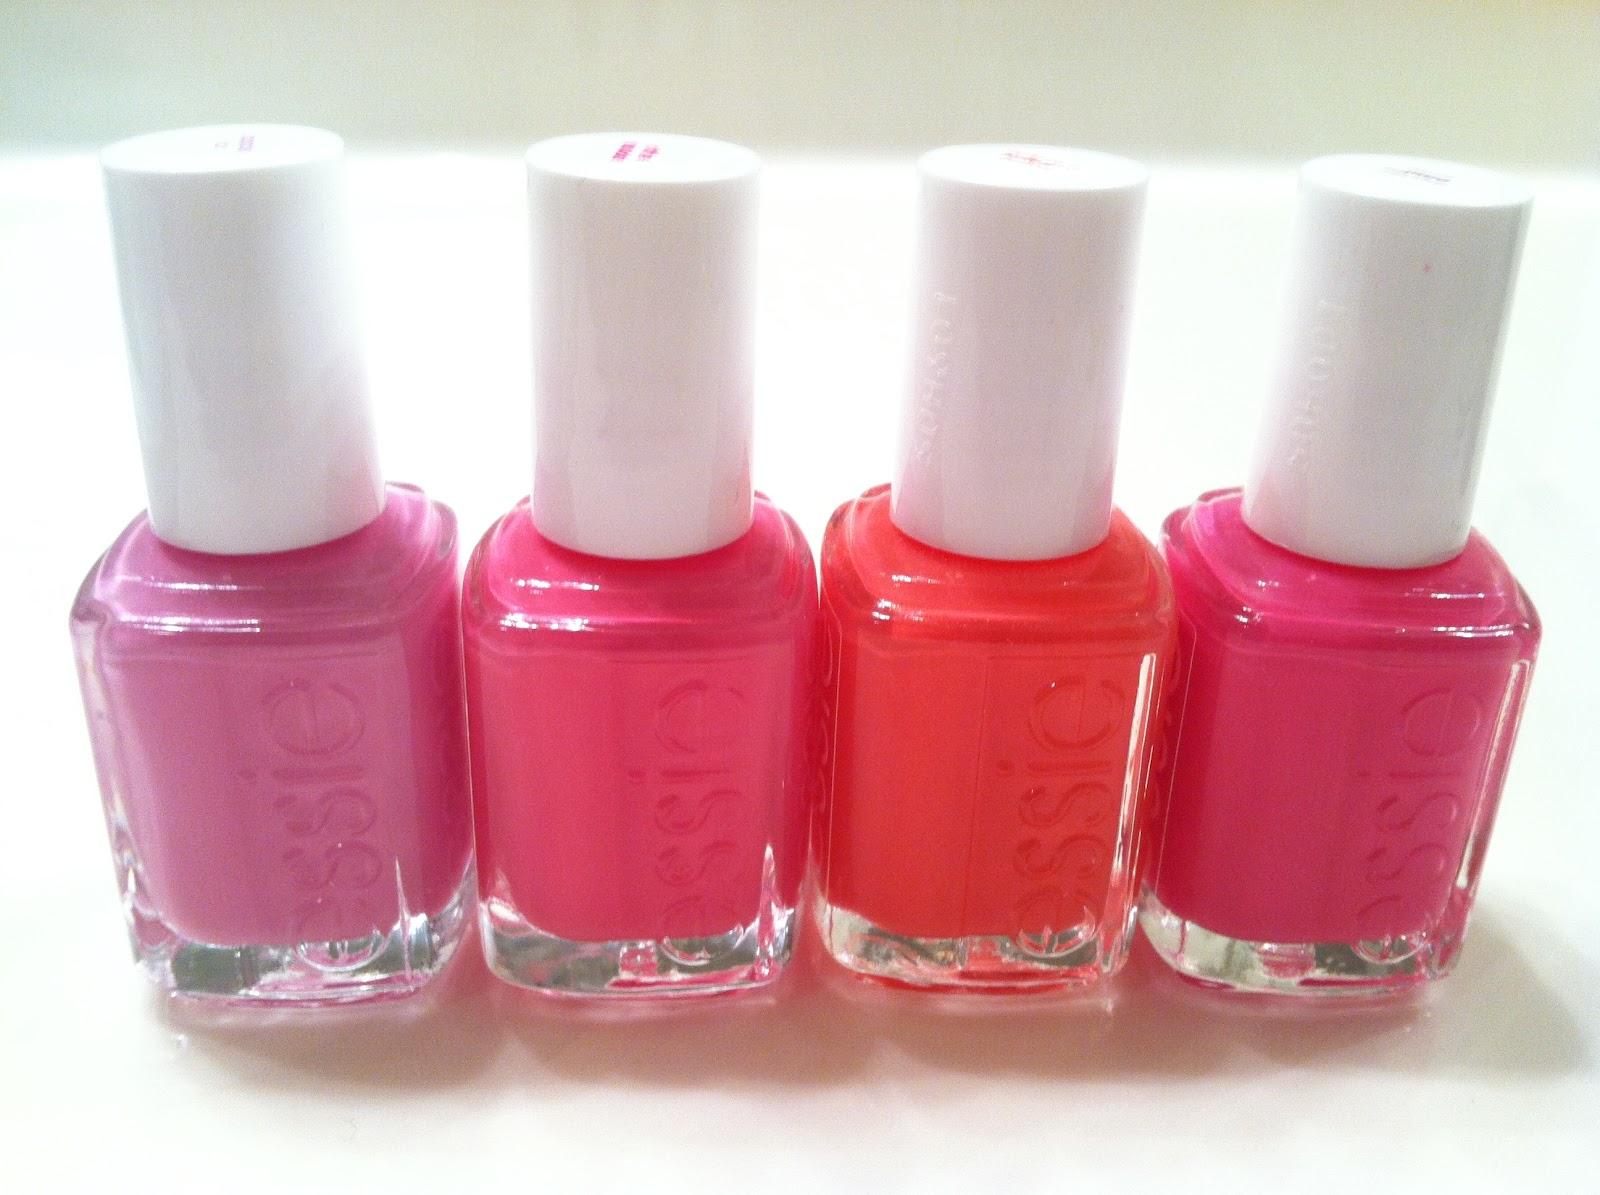 A Little Beauty Luxury: Top 4 Essie Pink Polish Picks